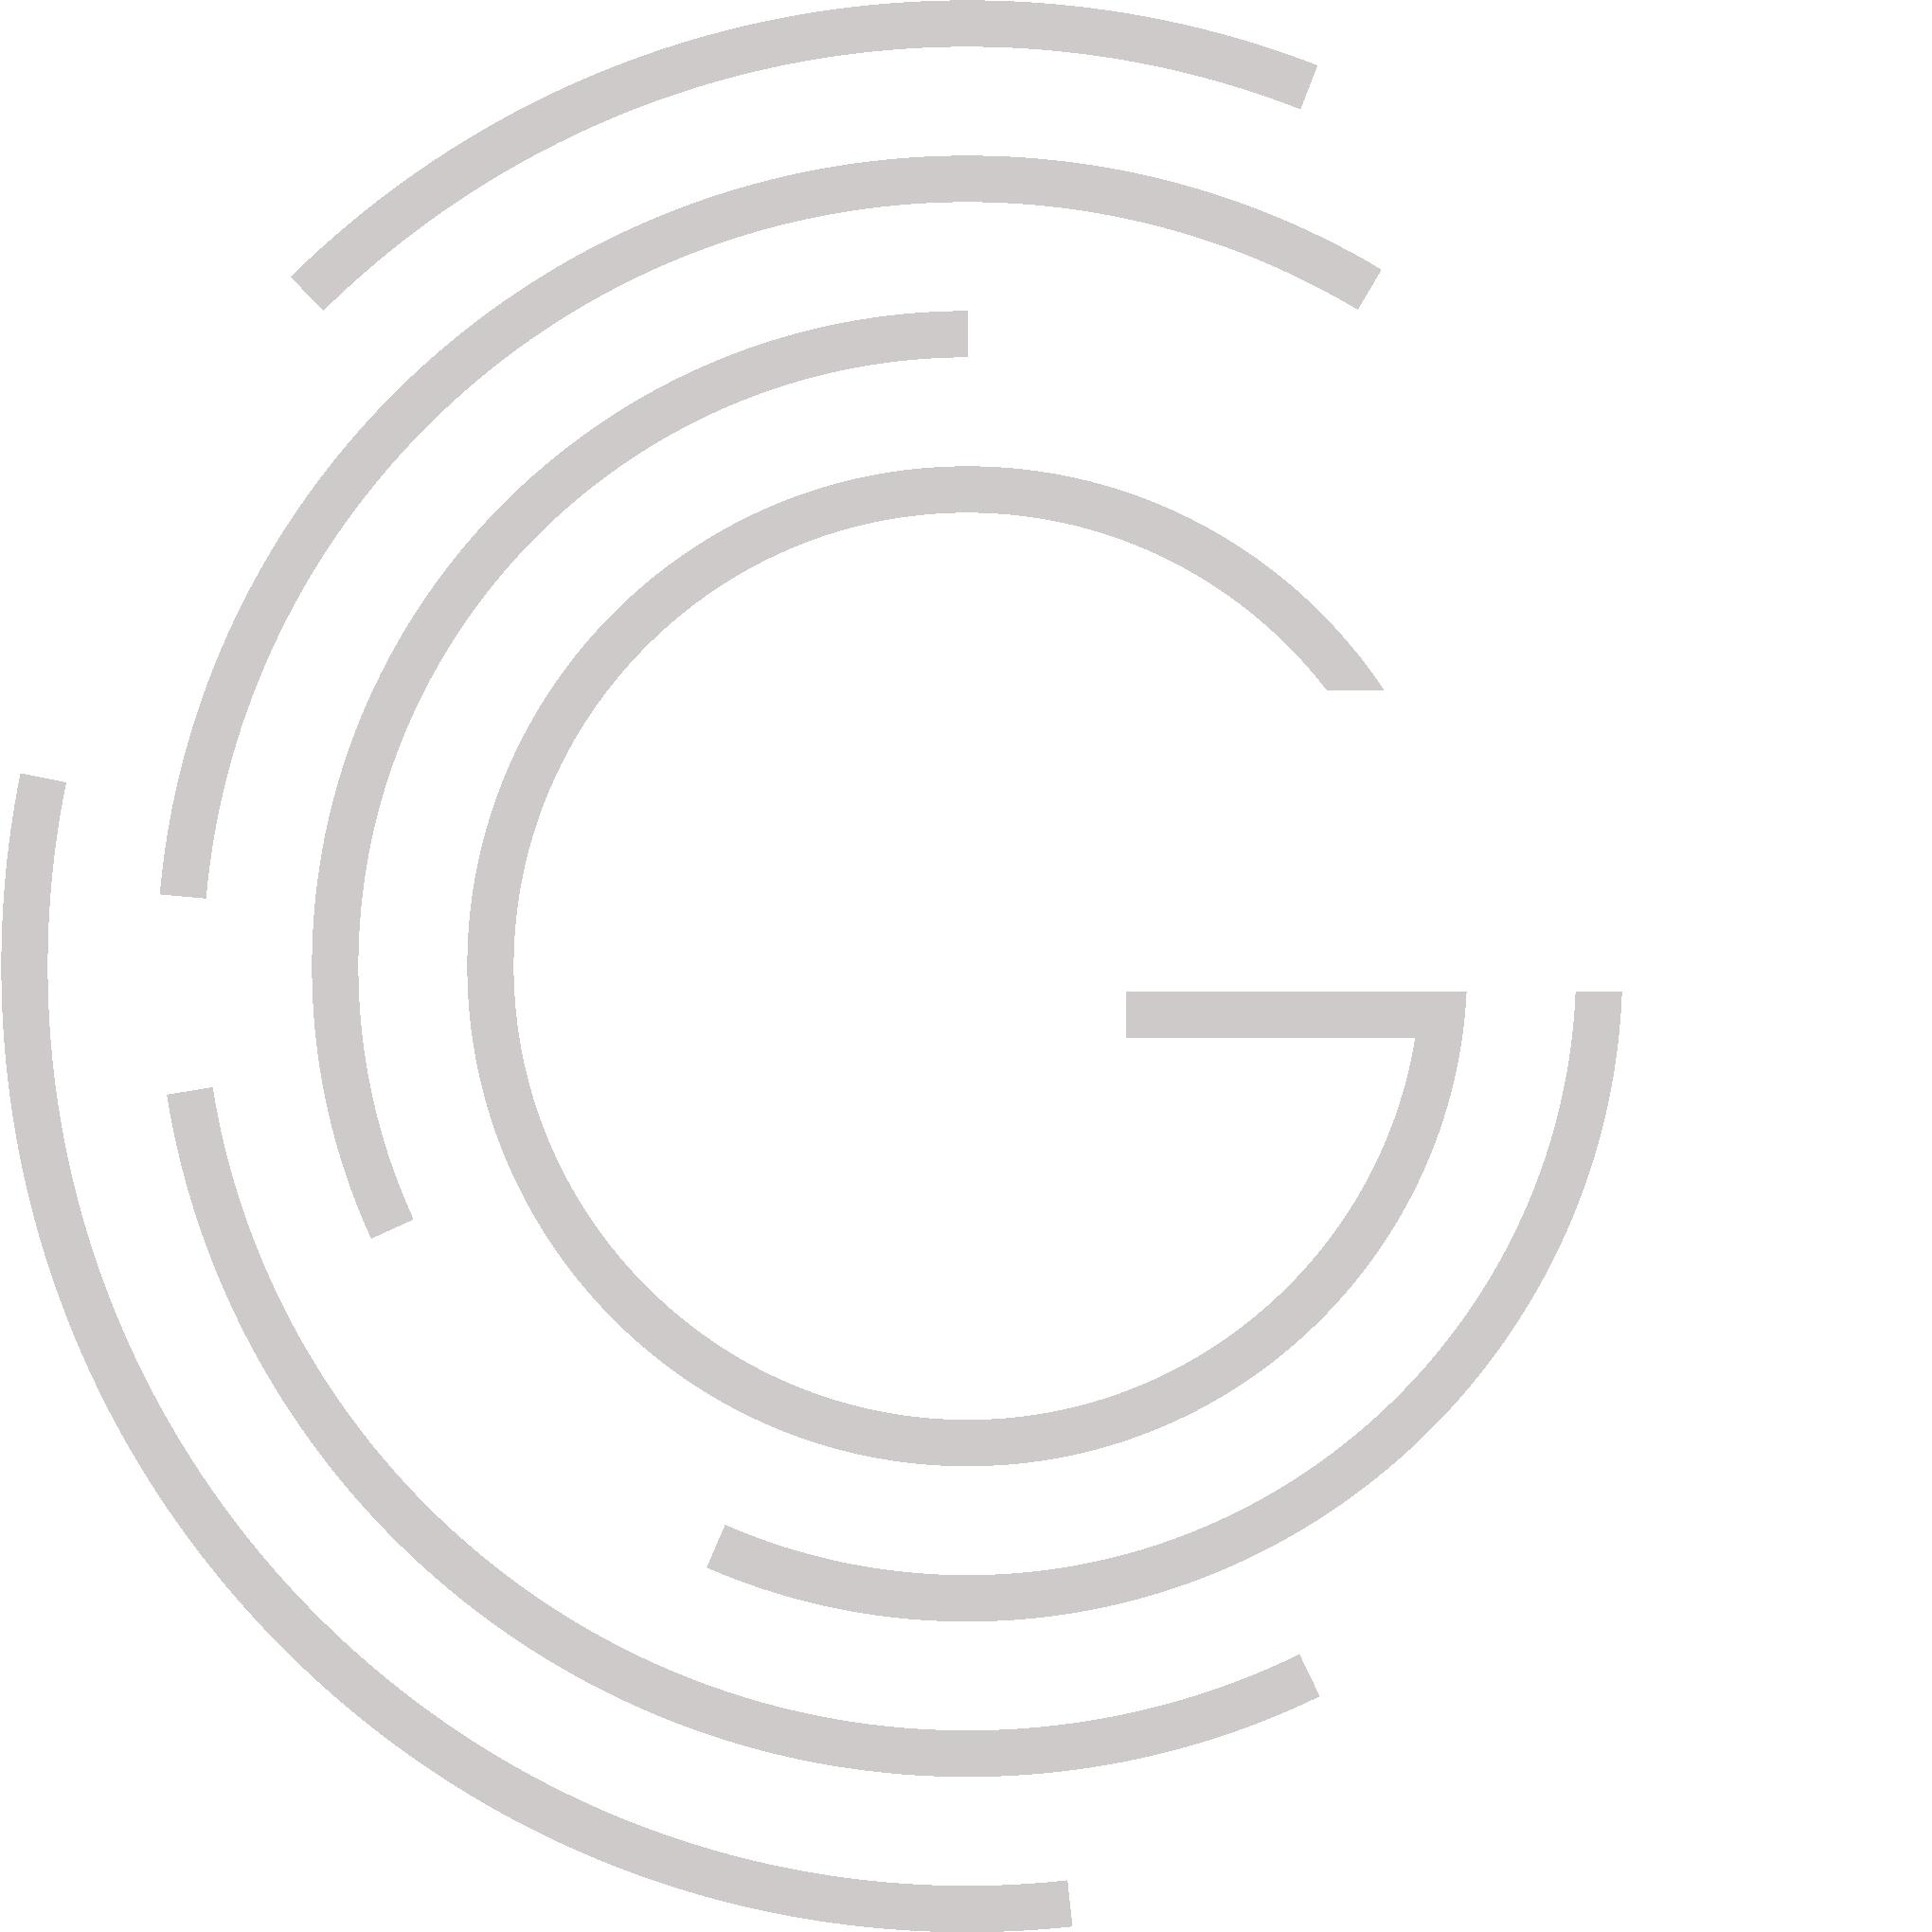 Our Portfolio | Paladin Capital Group